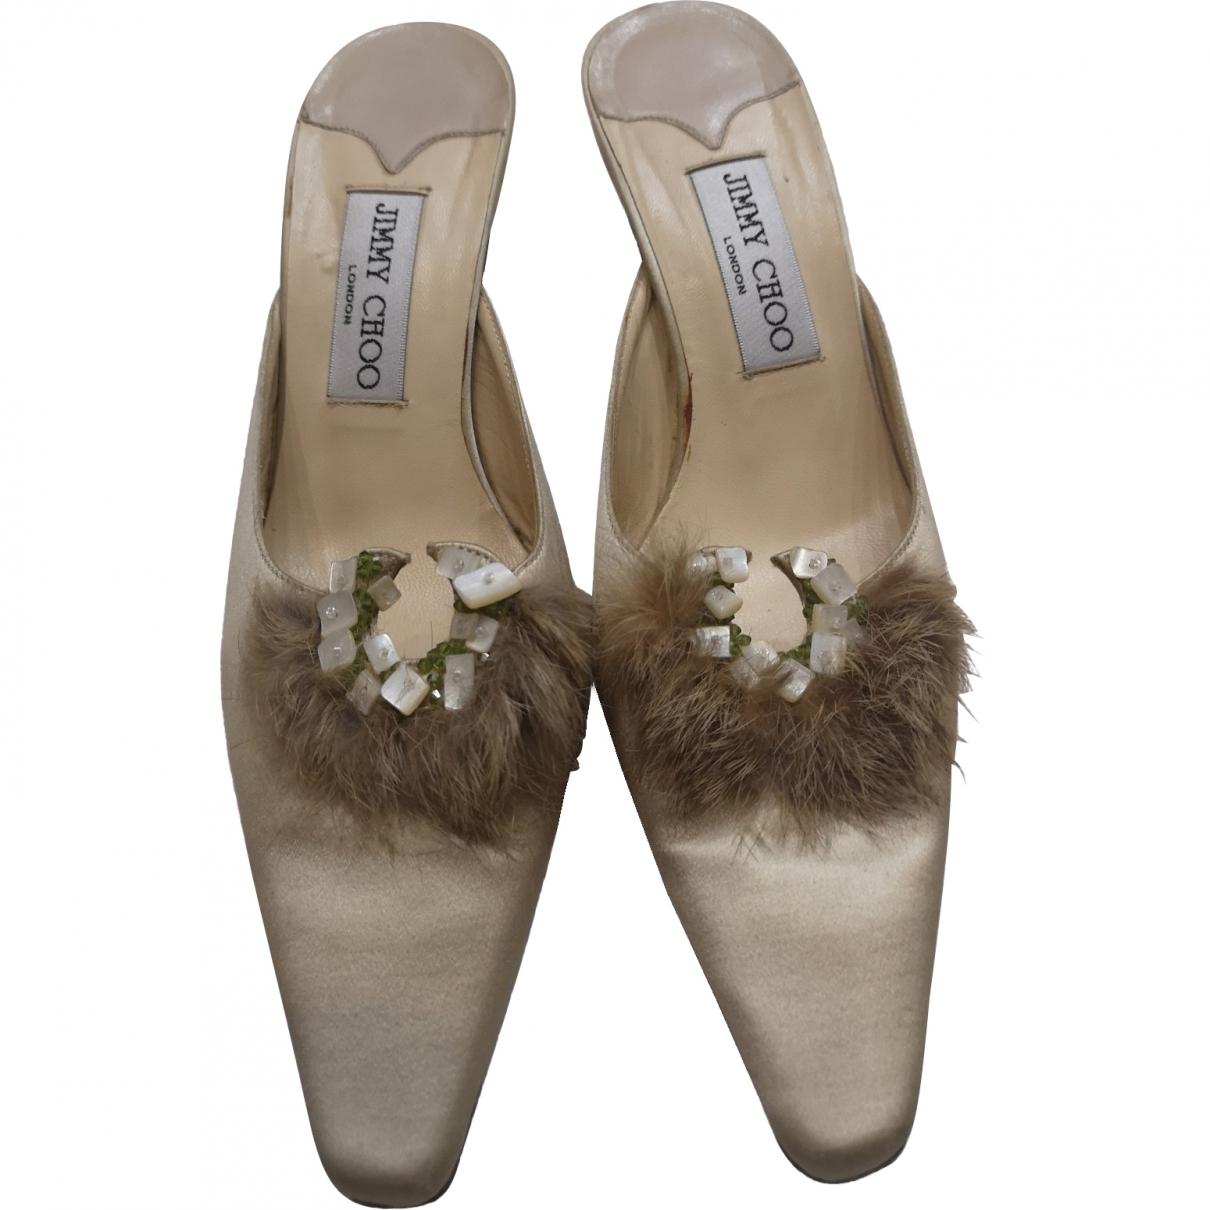 Jimmy Choo \N Beige Cloth Mules & Clogs for Women 37 EU